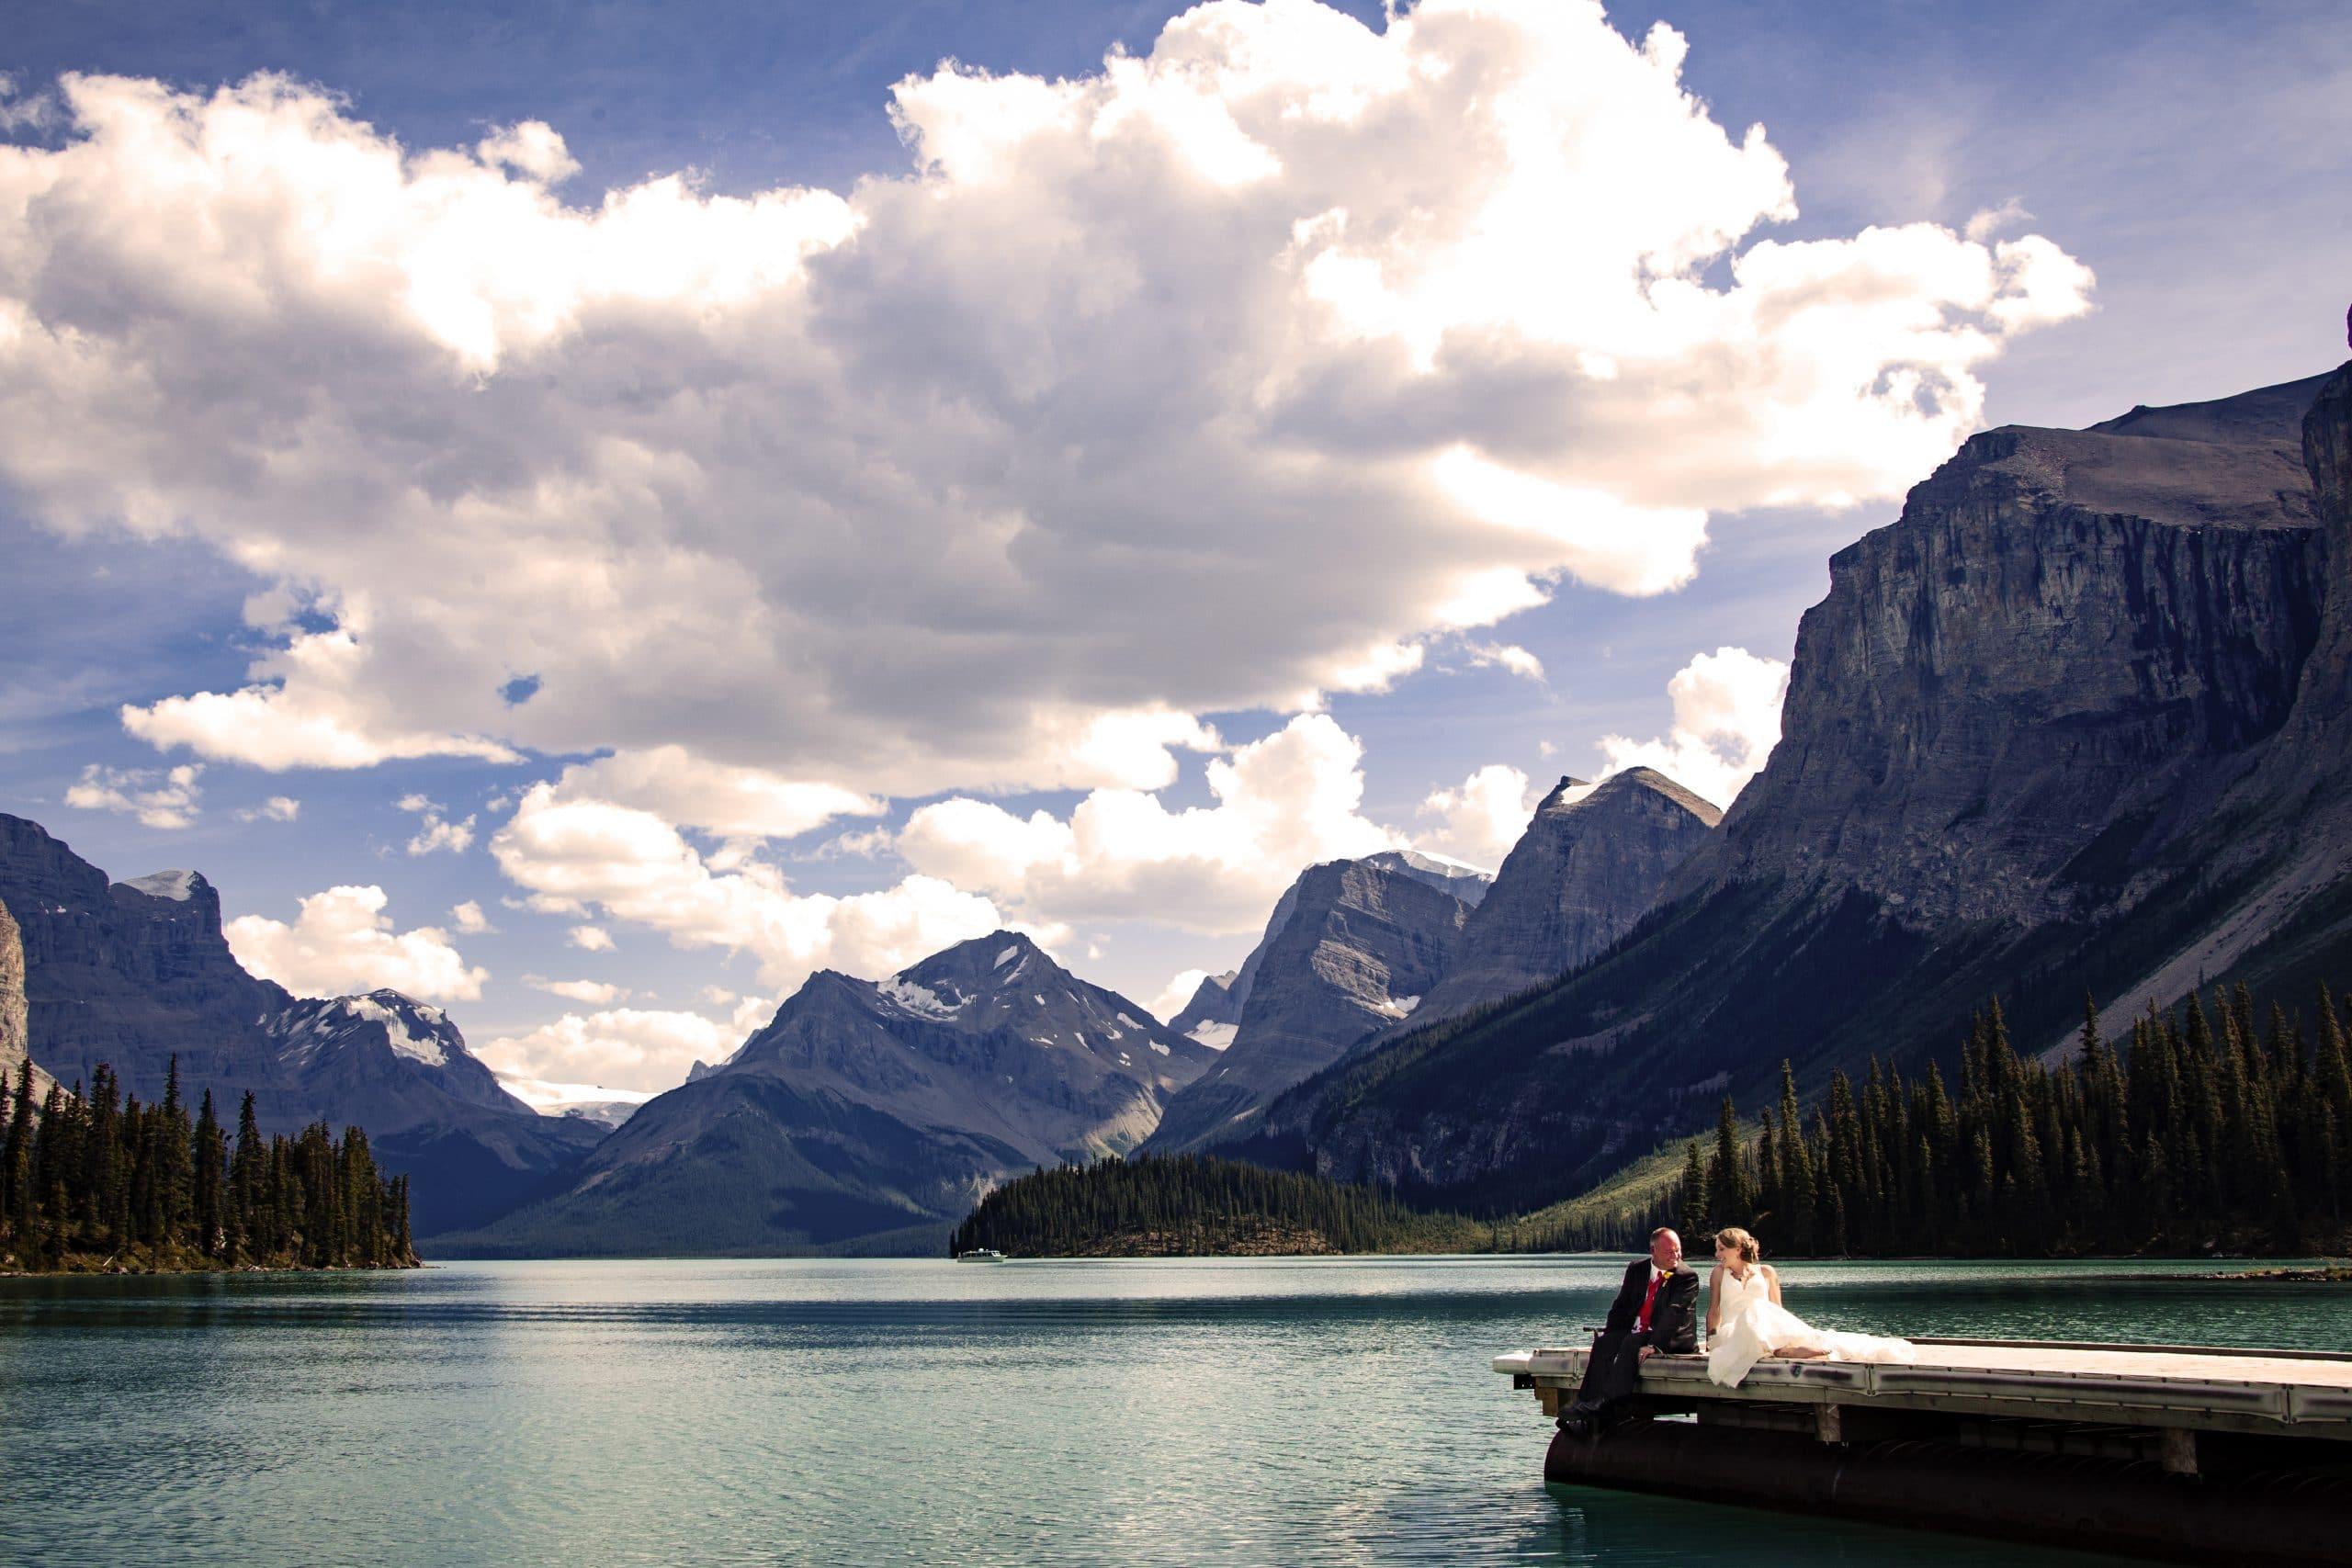 wedding couple sitting on a dock at Maligne Lake - Your Jasper wedding photography consultation